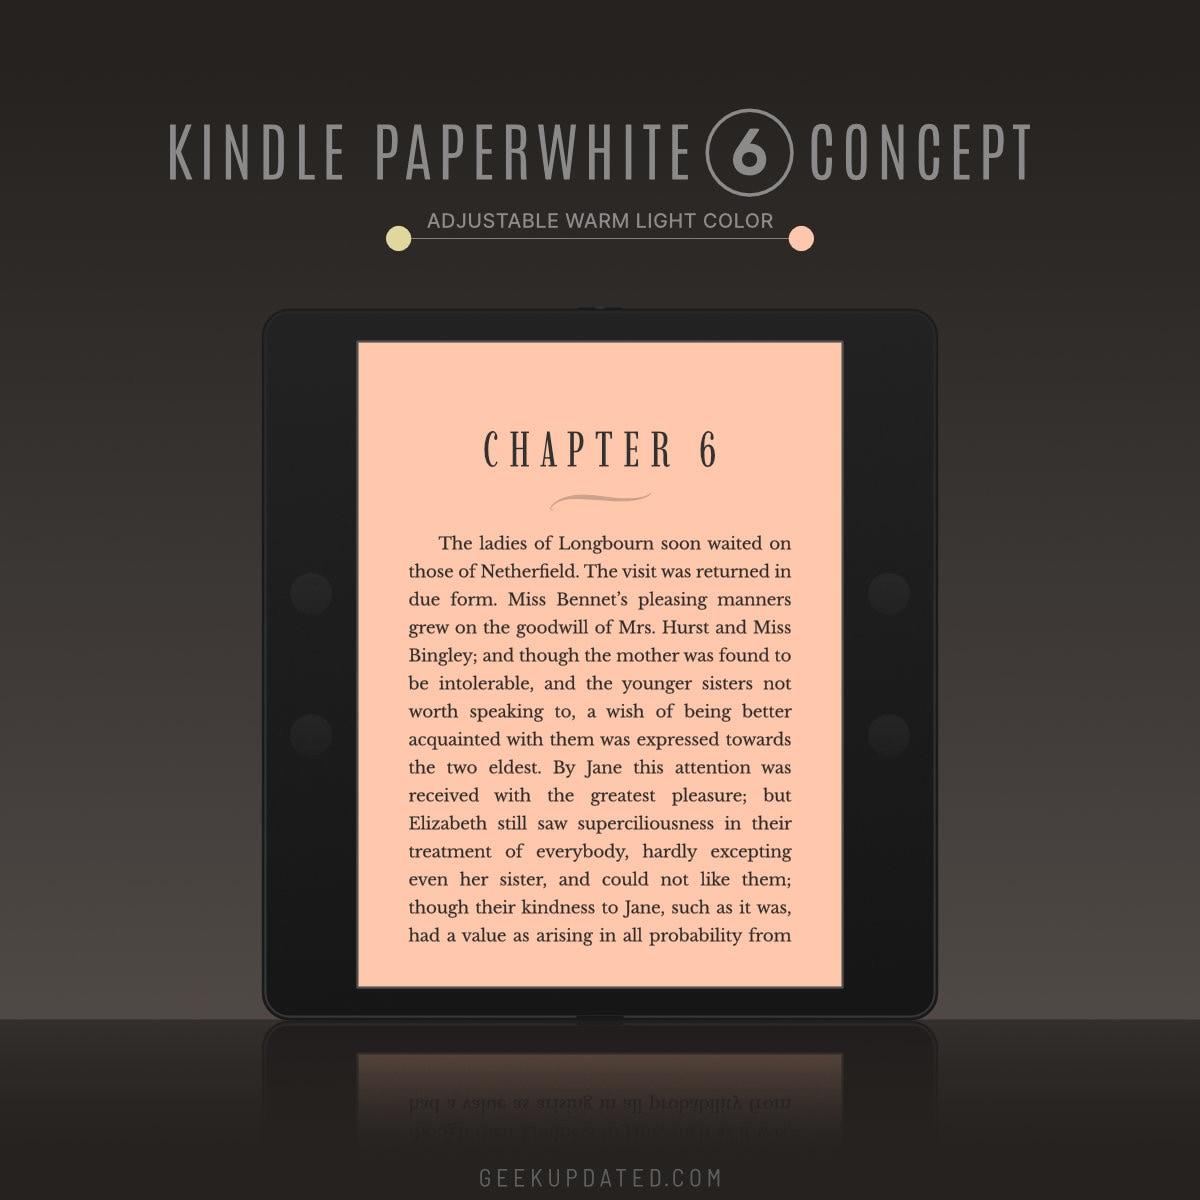 Kindle Paperwhite 6 concept - orange warm light